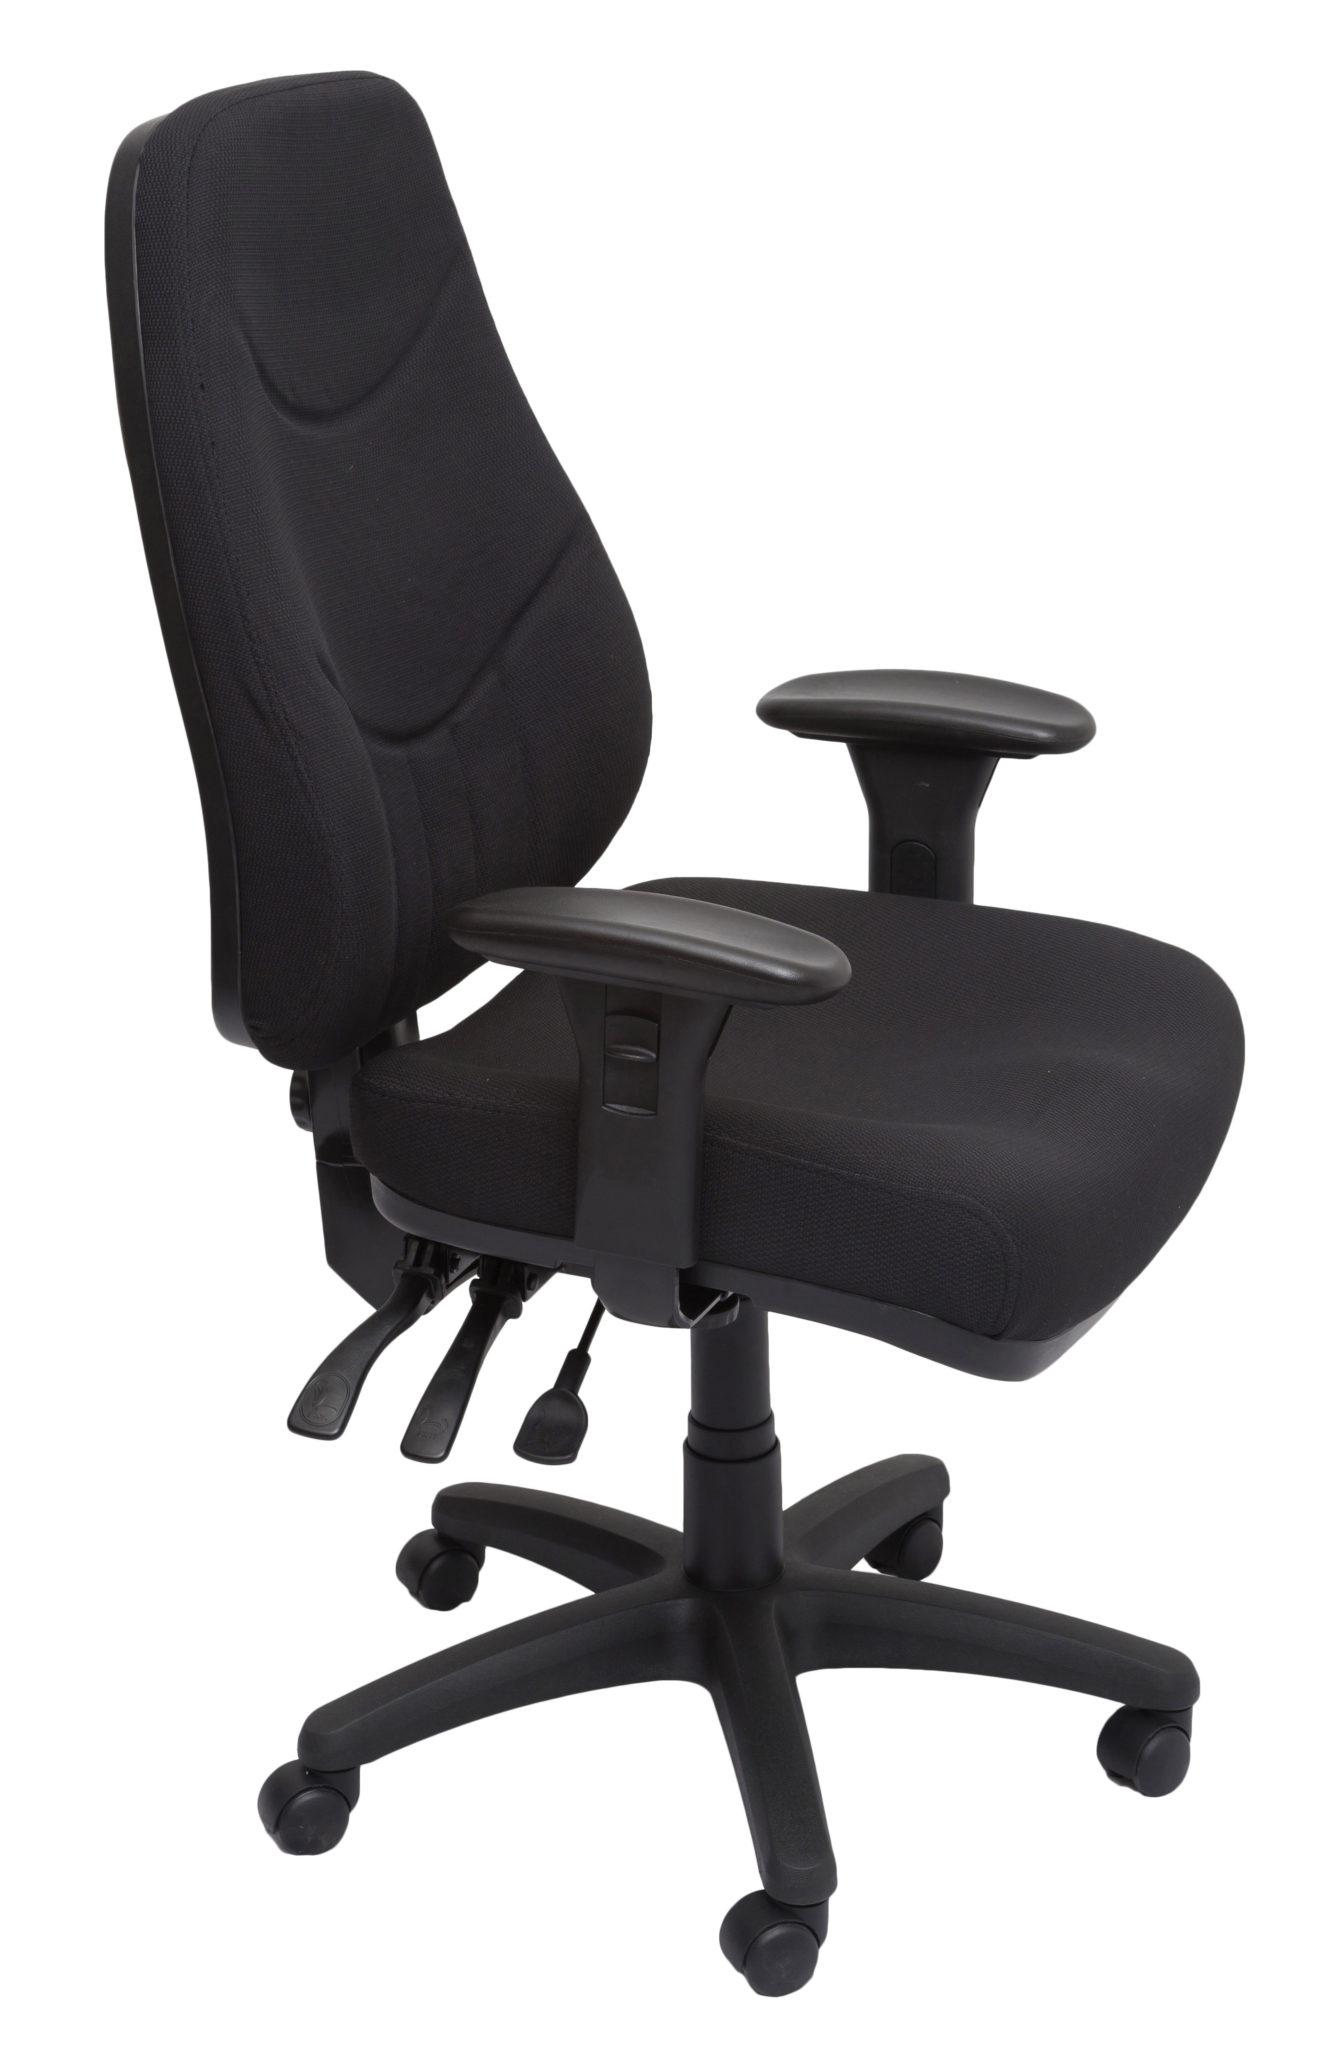 Lander 3 Lever Heavy Duty Contemporary Fabric Executive Chair